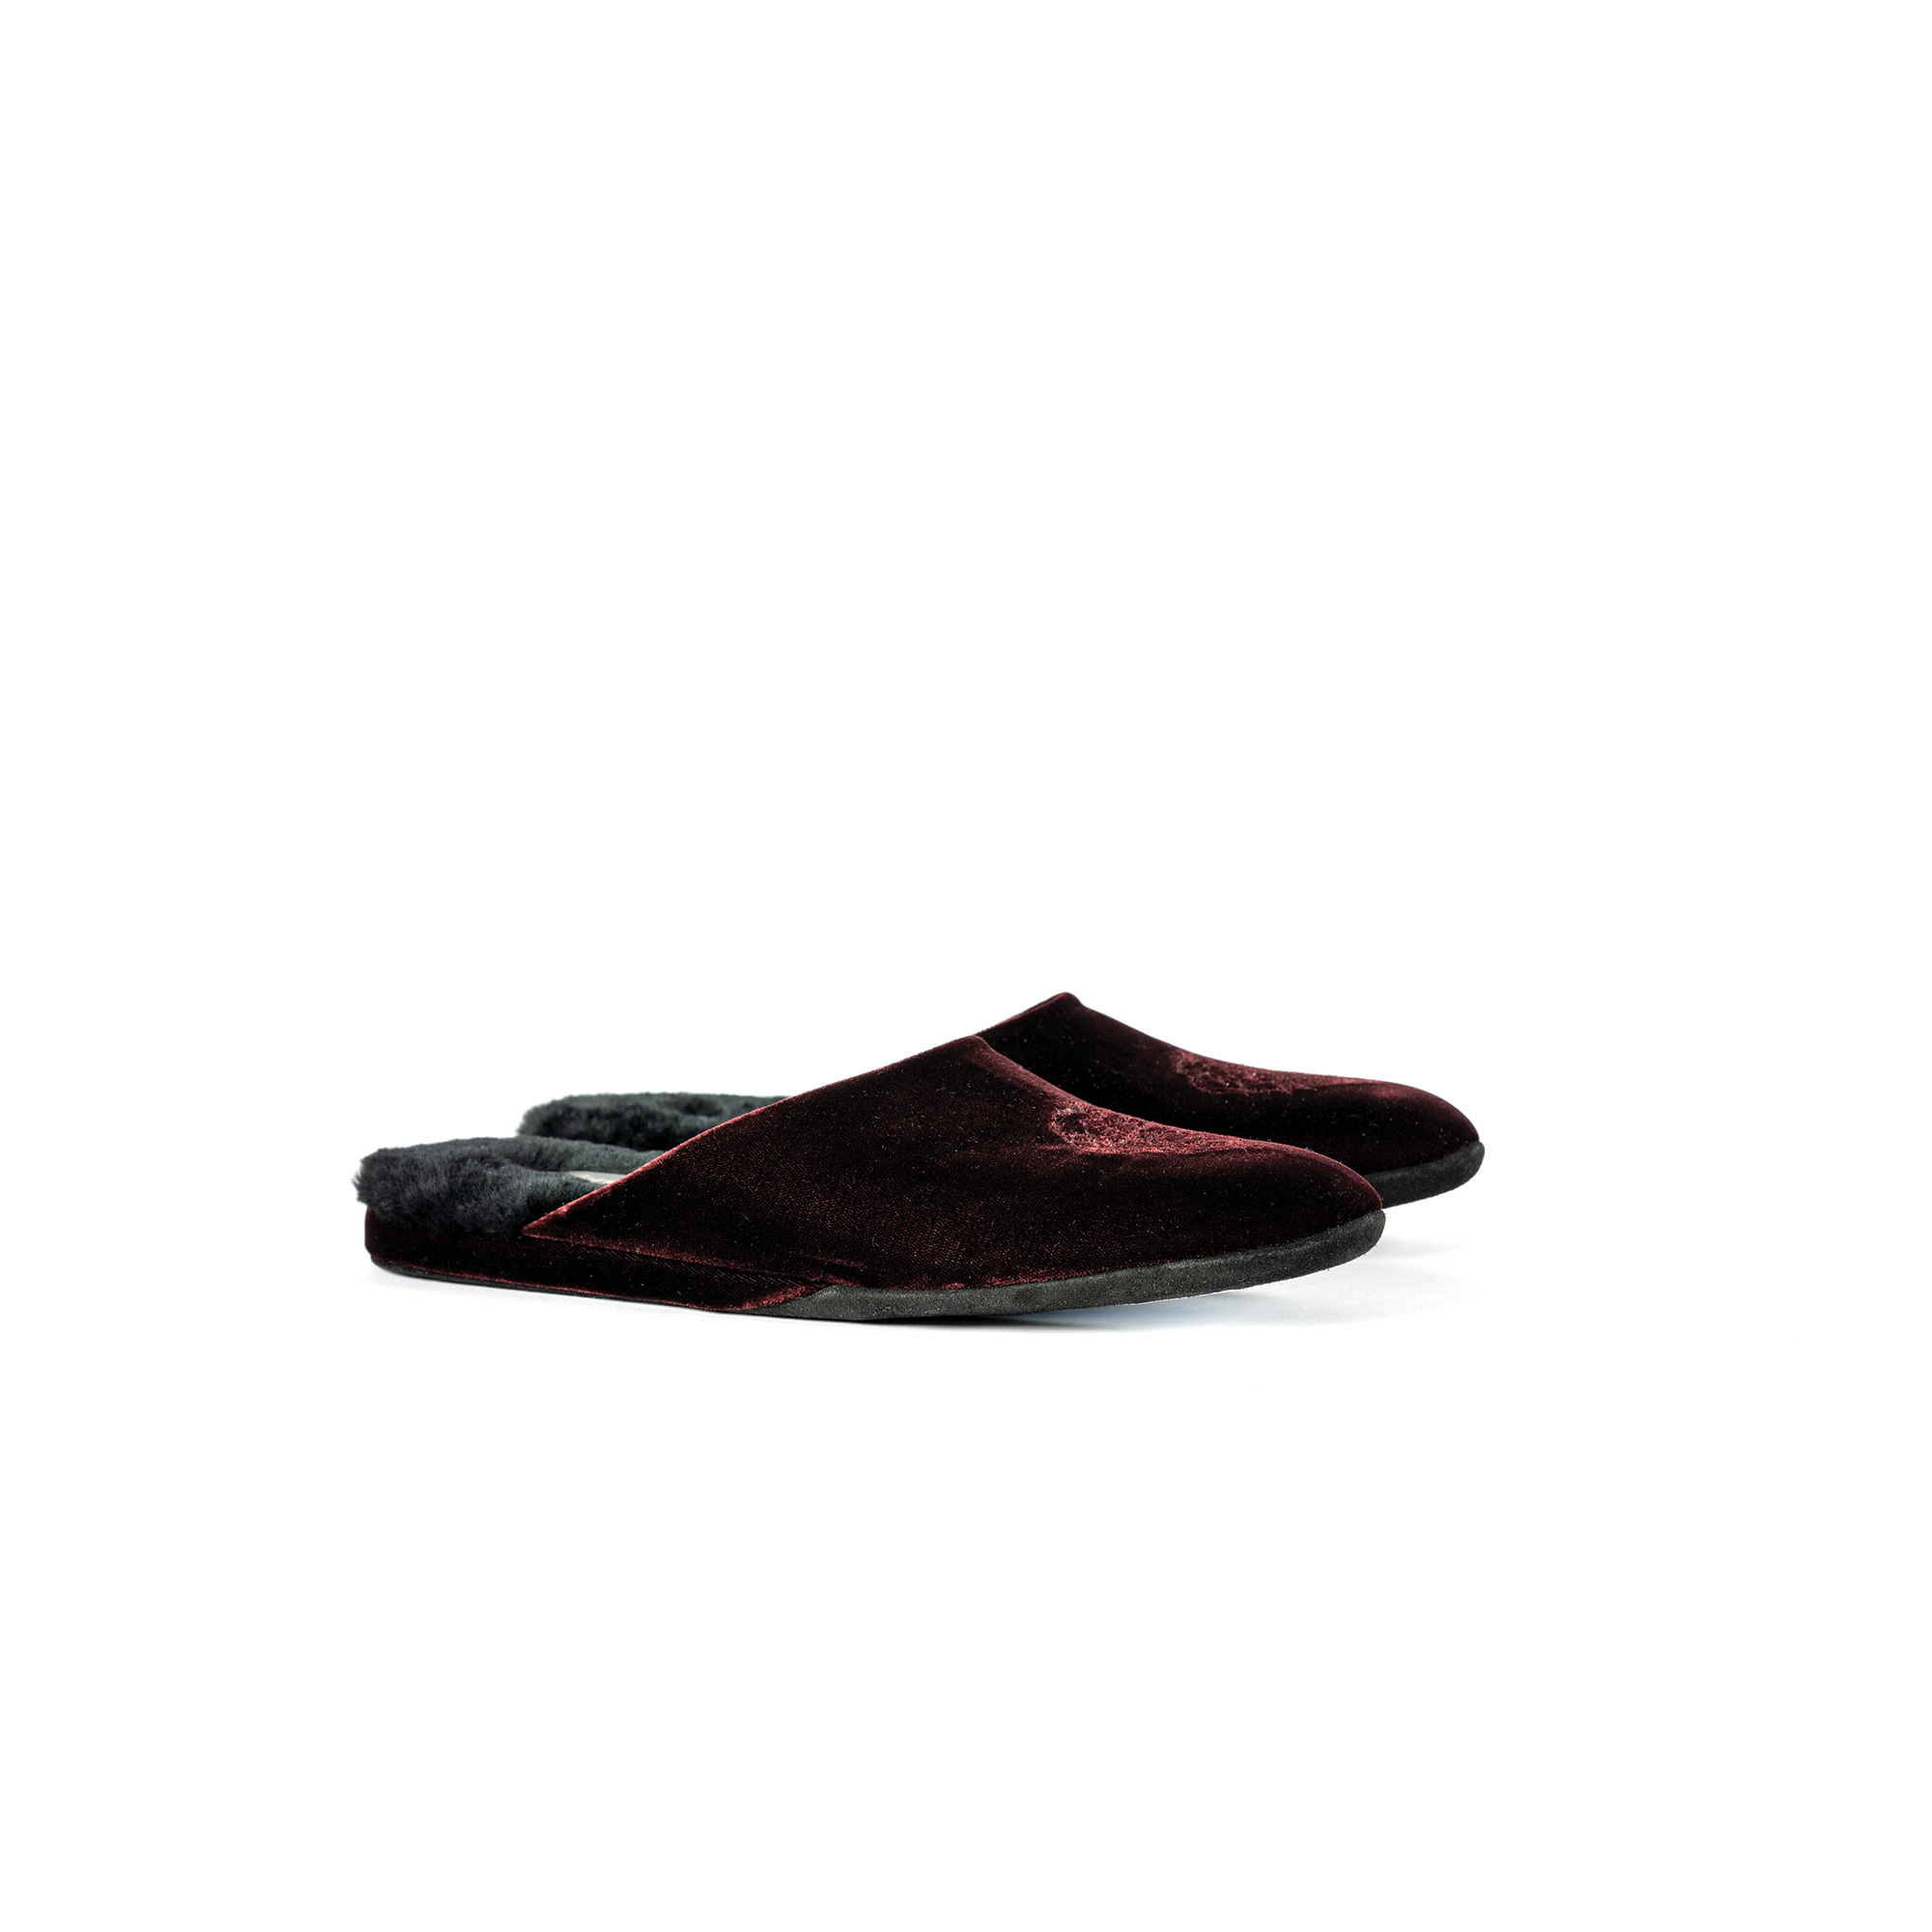 Indoor evening slipper in burnt velvet - Farfalla italian slippers